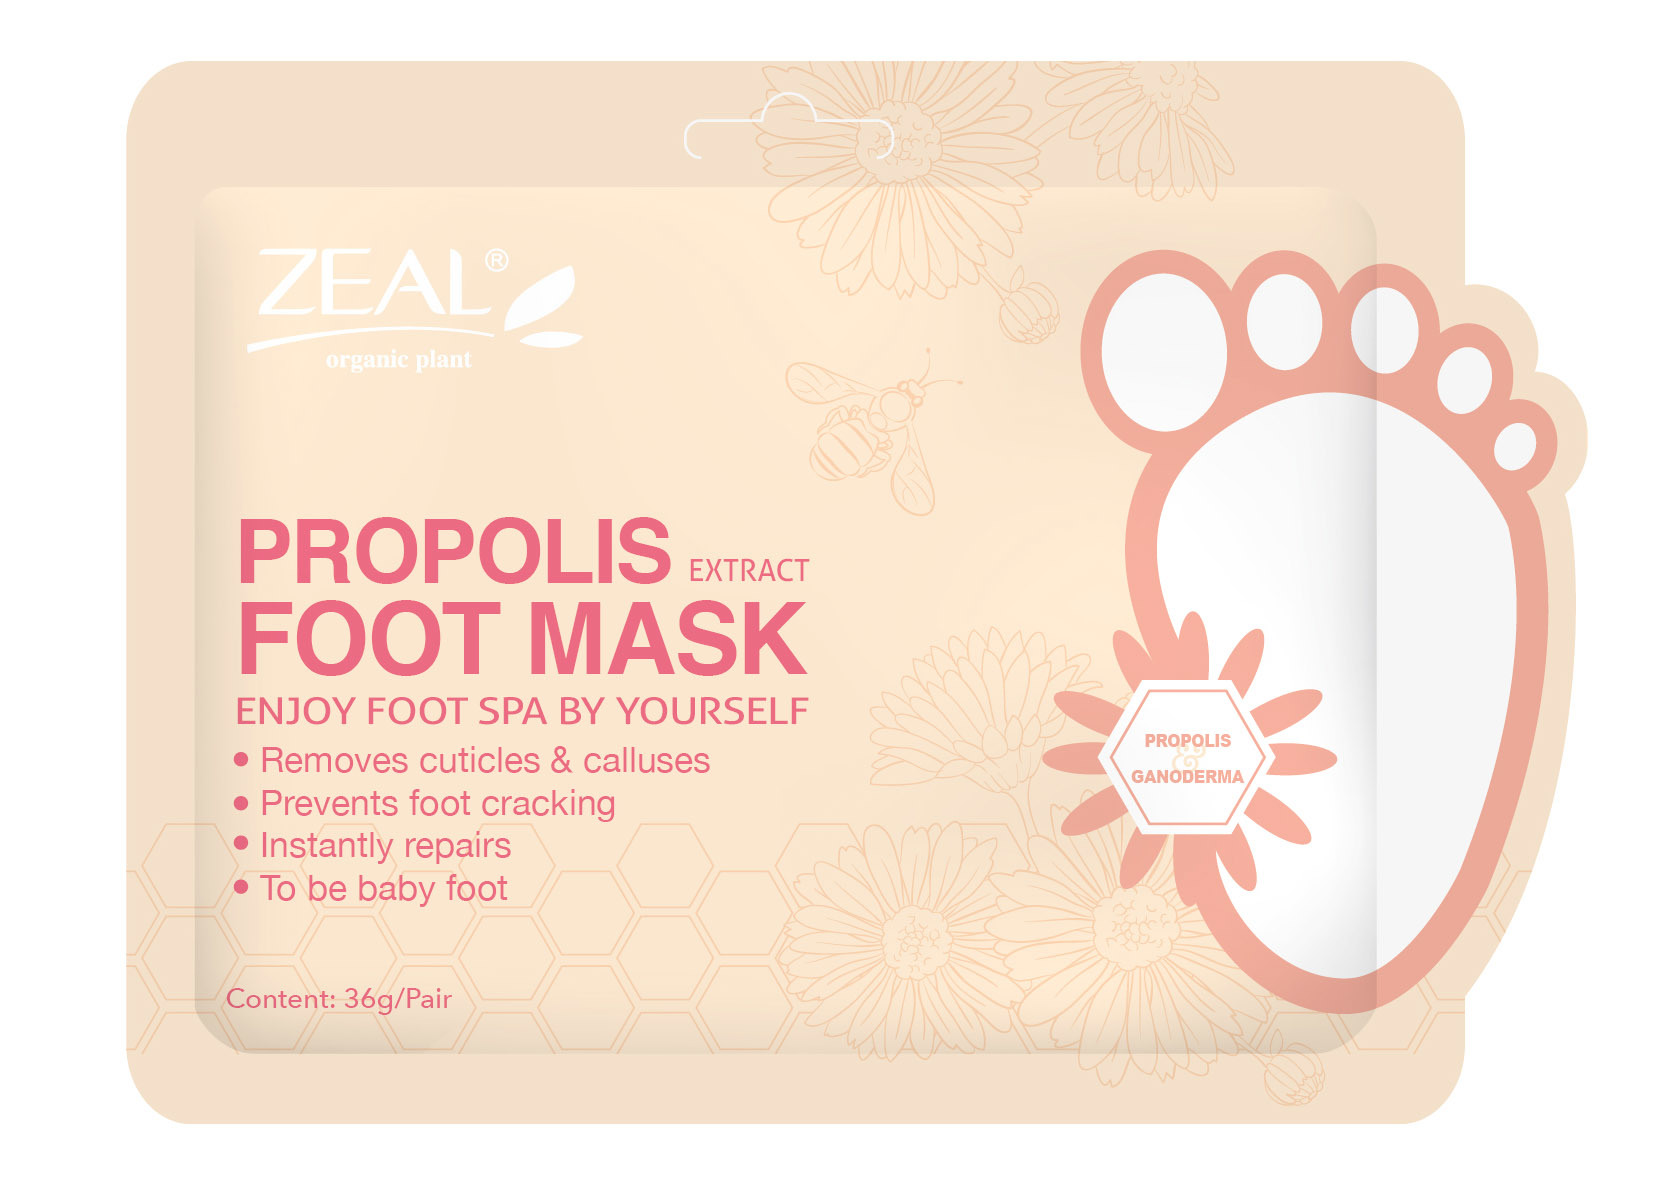 Zeal Propolis & Pearl Whitening & Brighten Foot Mask Cosmetic